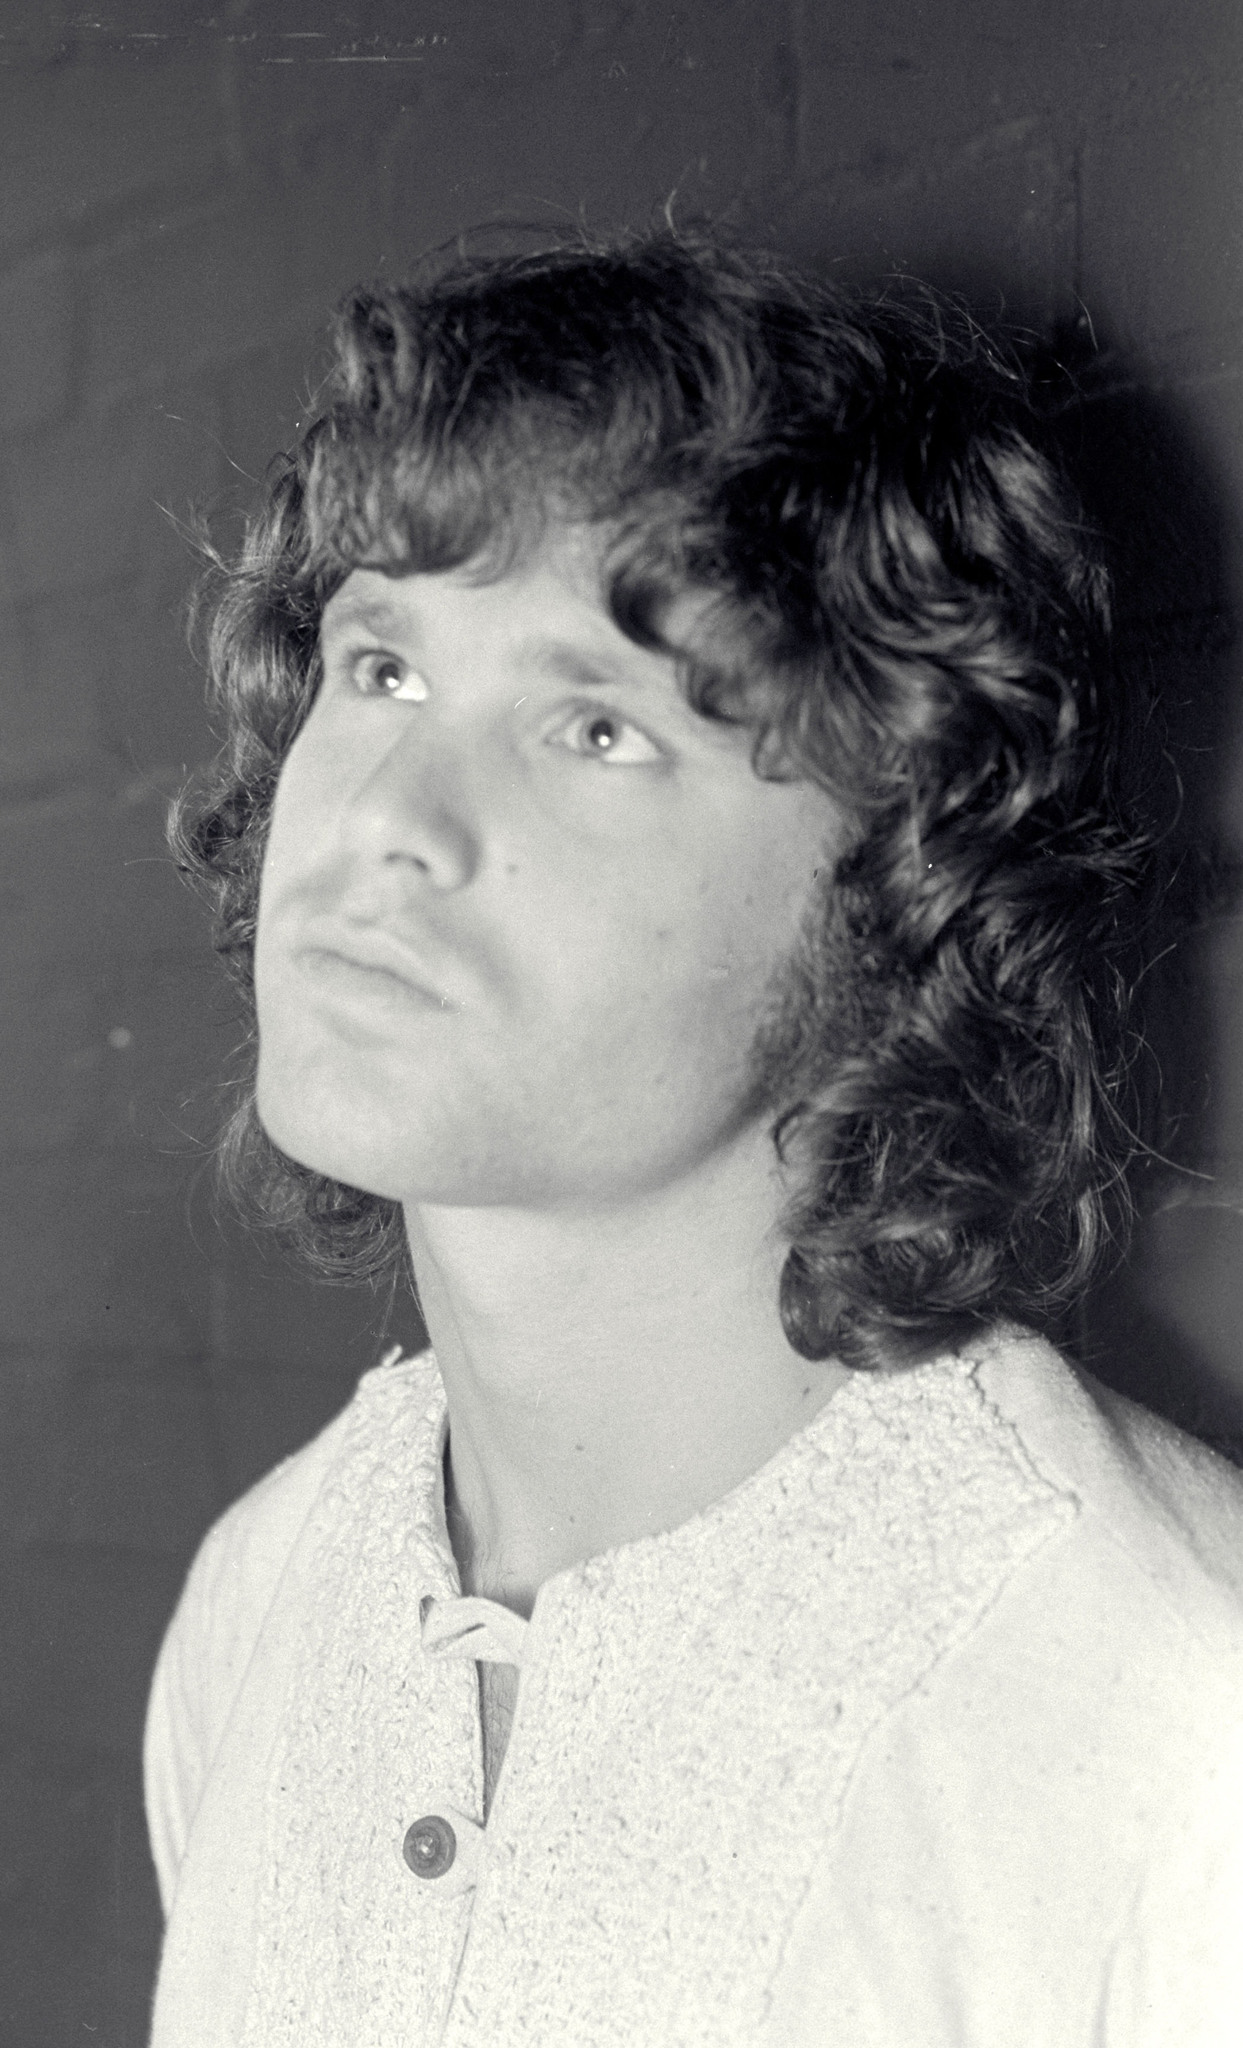 Jim Morrison Imdb